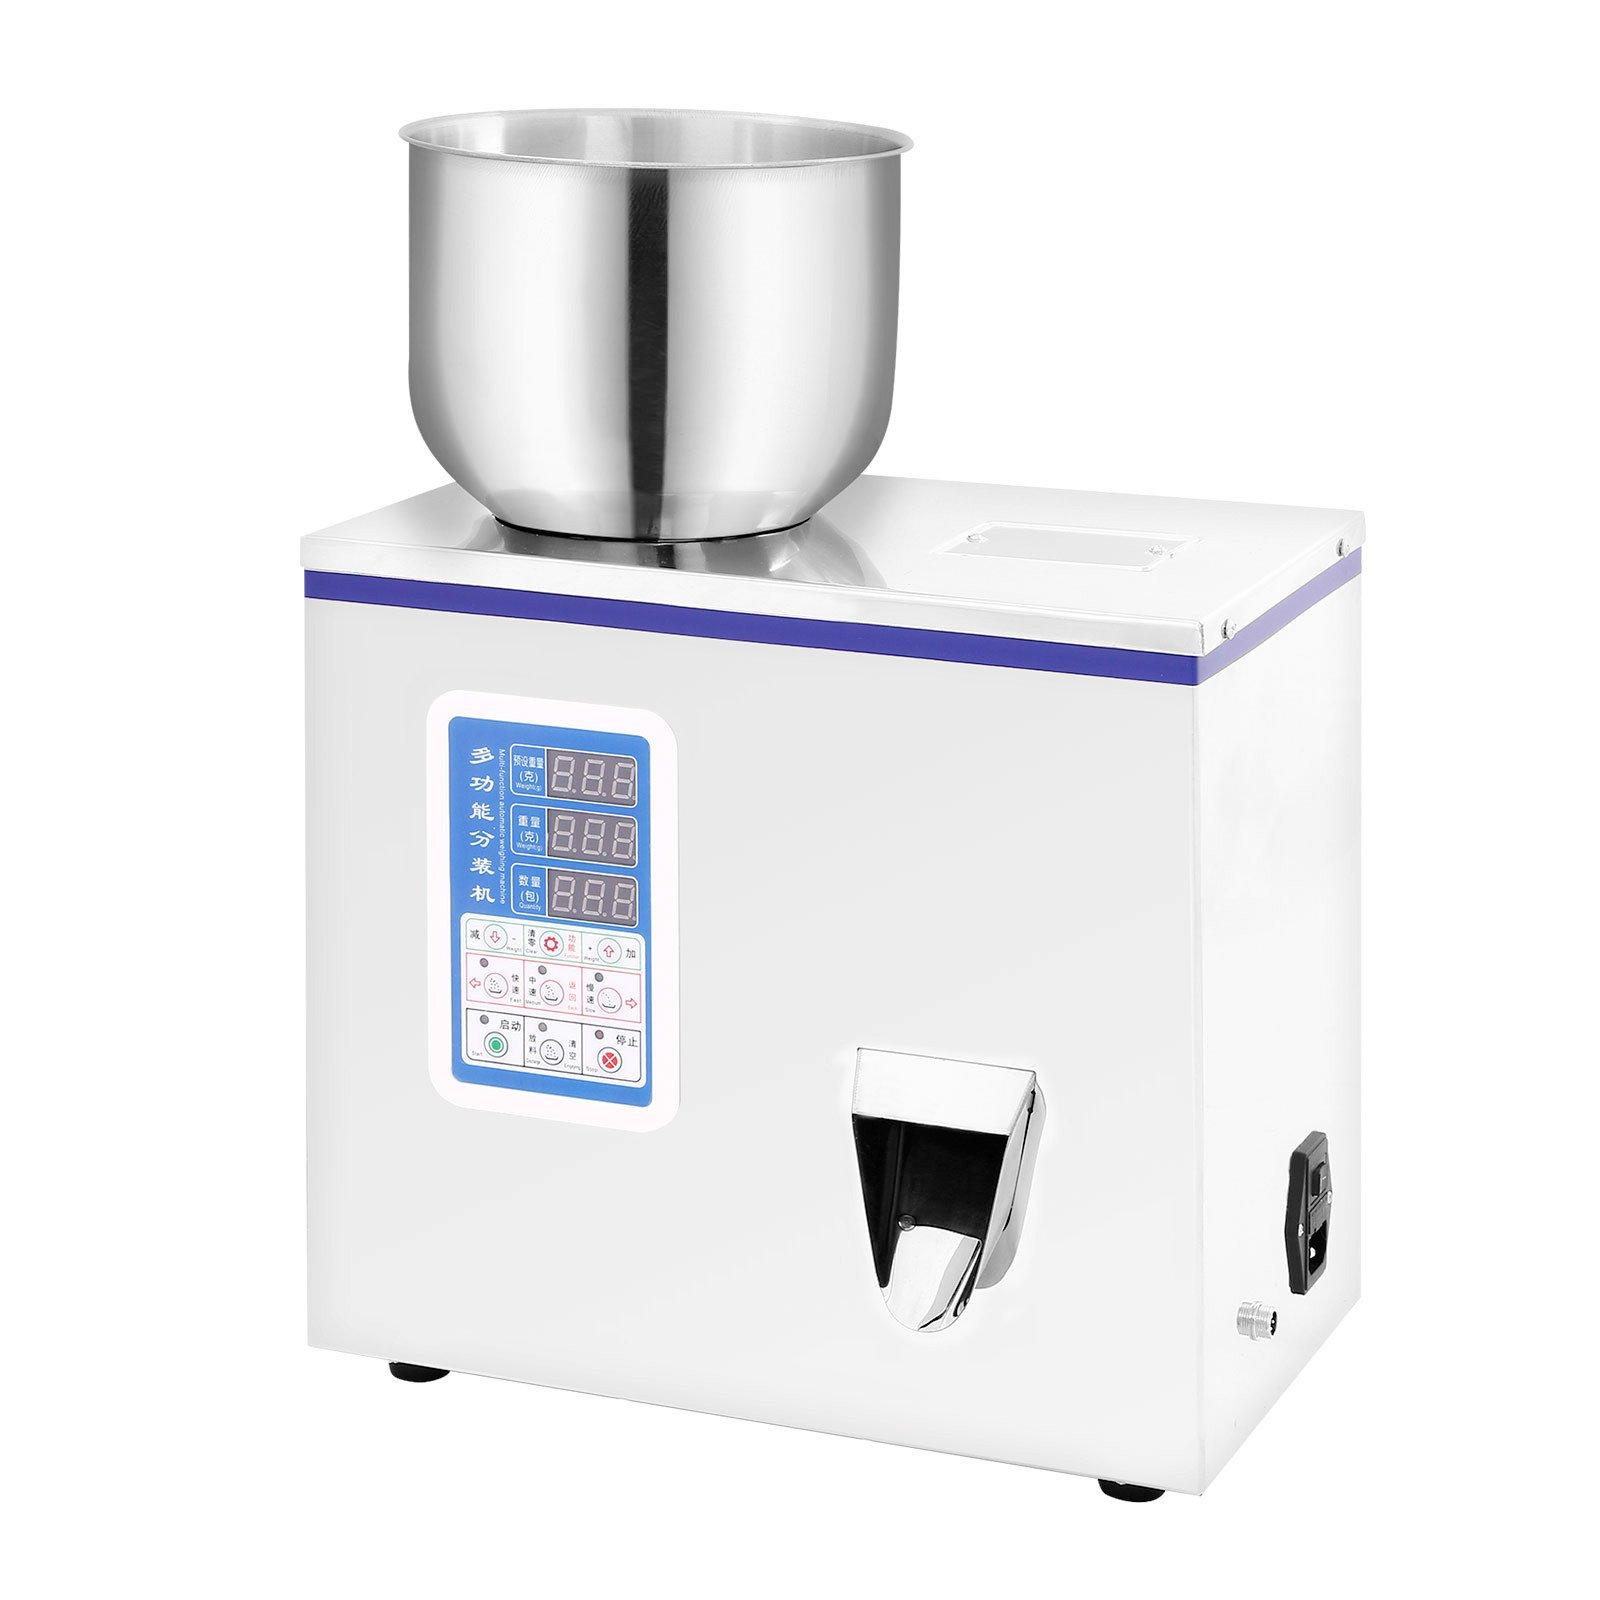 Forkwin Powder Filler Machine 150W Powder Filling Machine 2-100g Weighing Filling Machine Automatic Powder Filling Equipment for Sealing Tea Grain Seeds